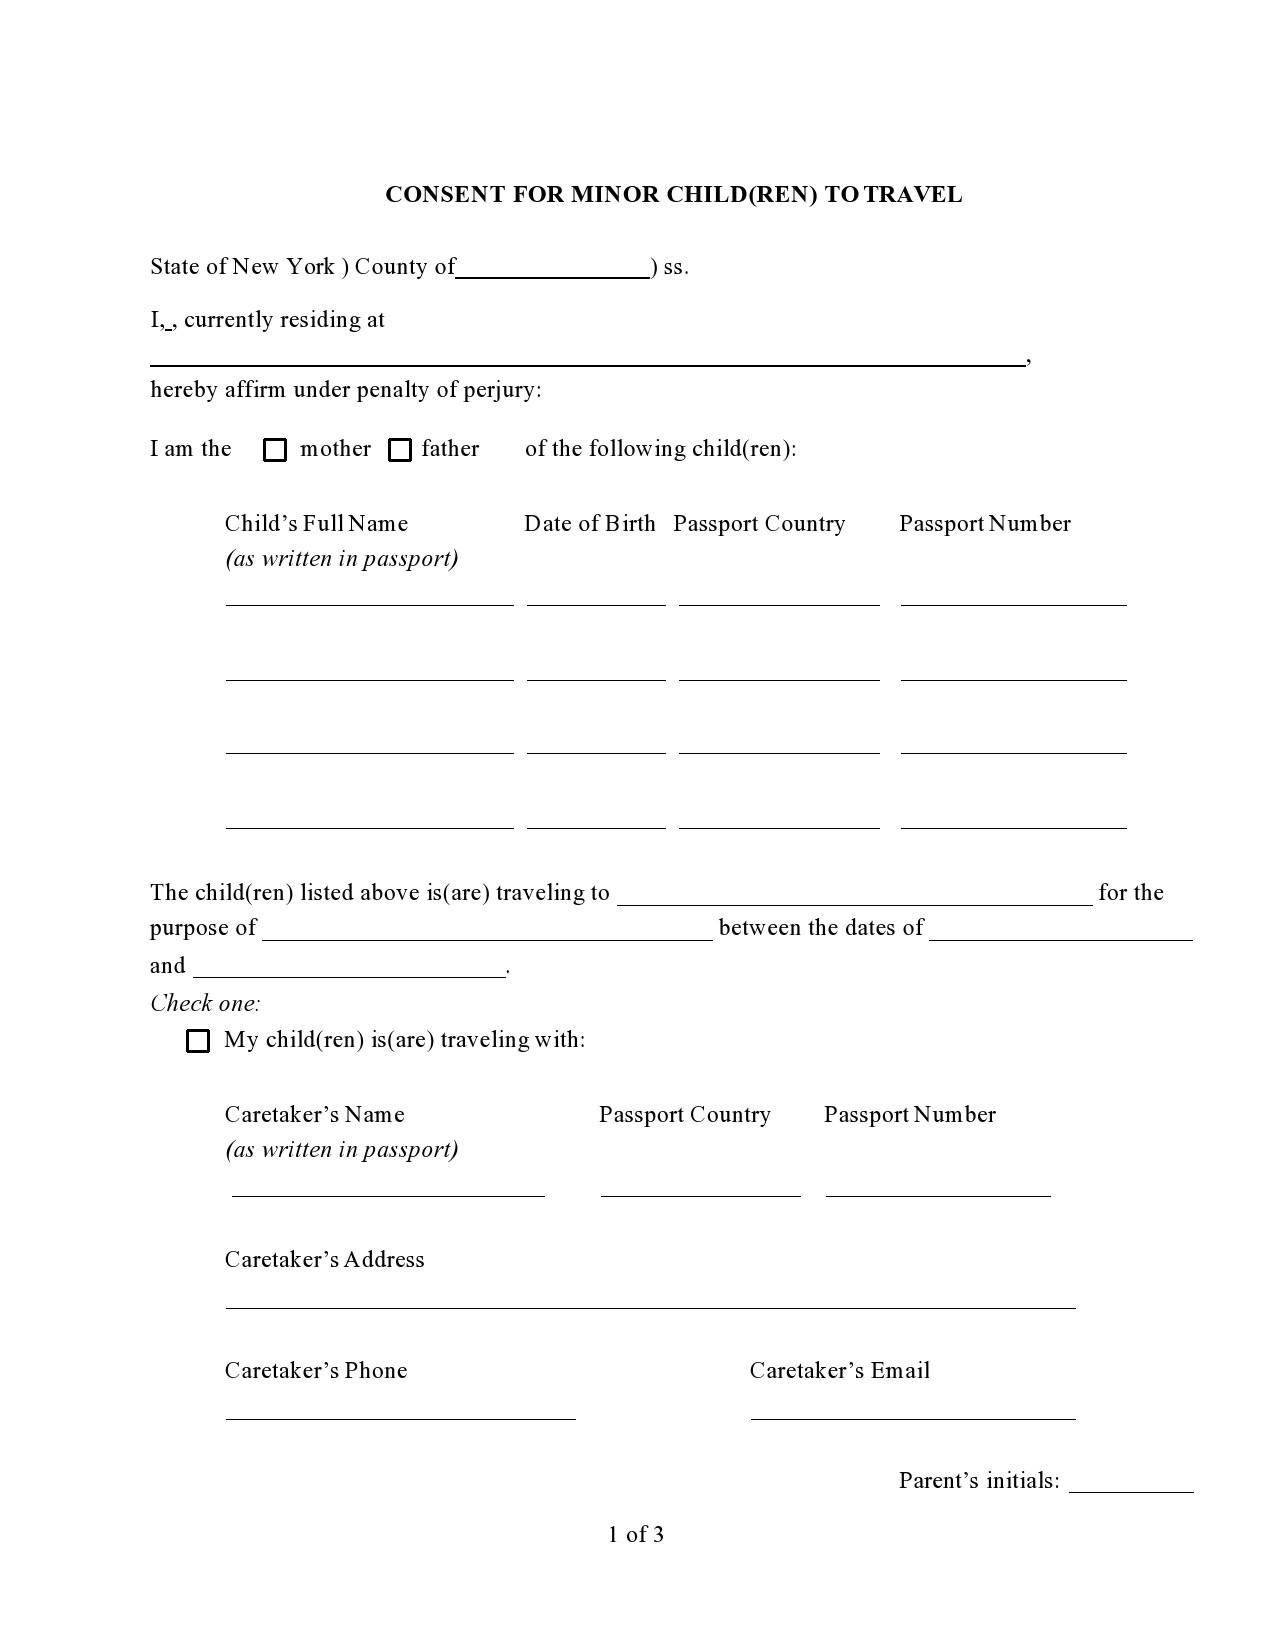 Free child travel consent form 15